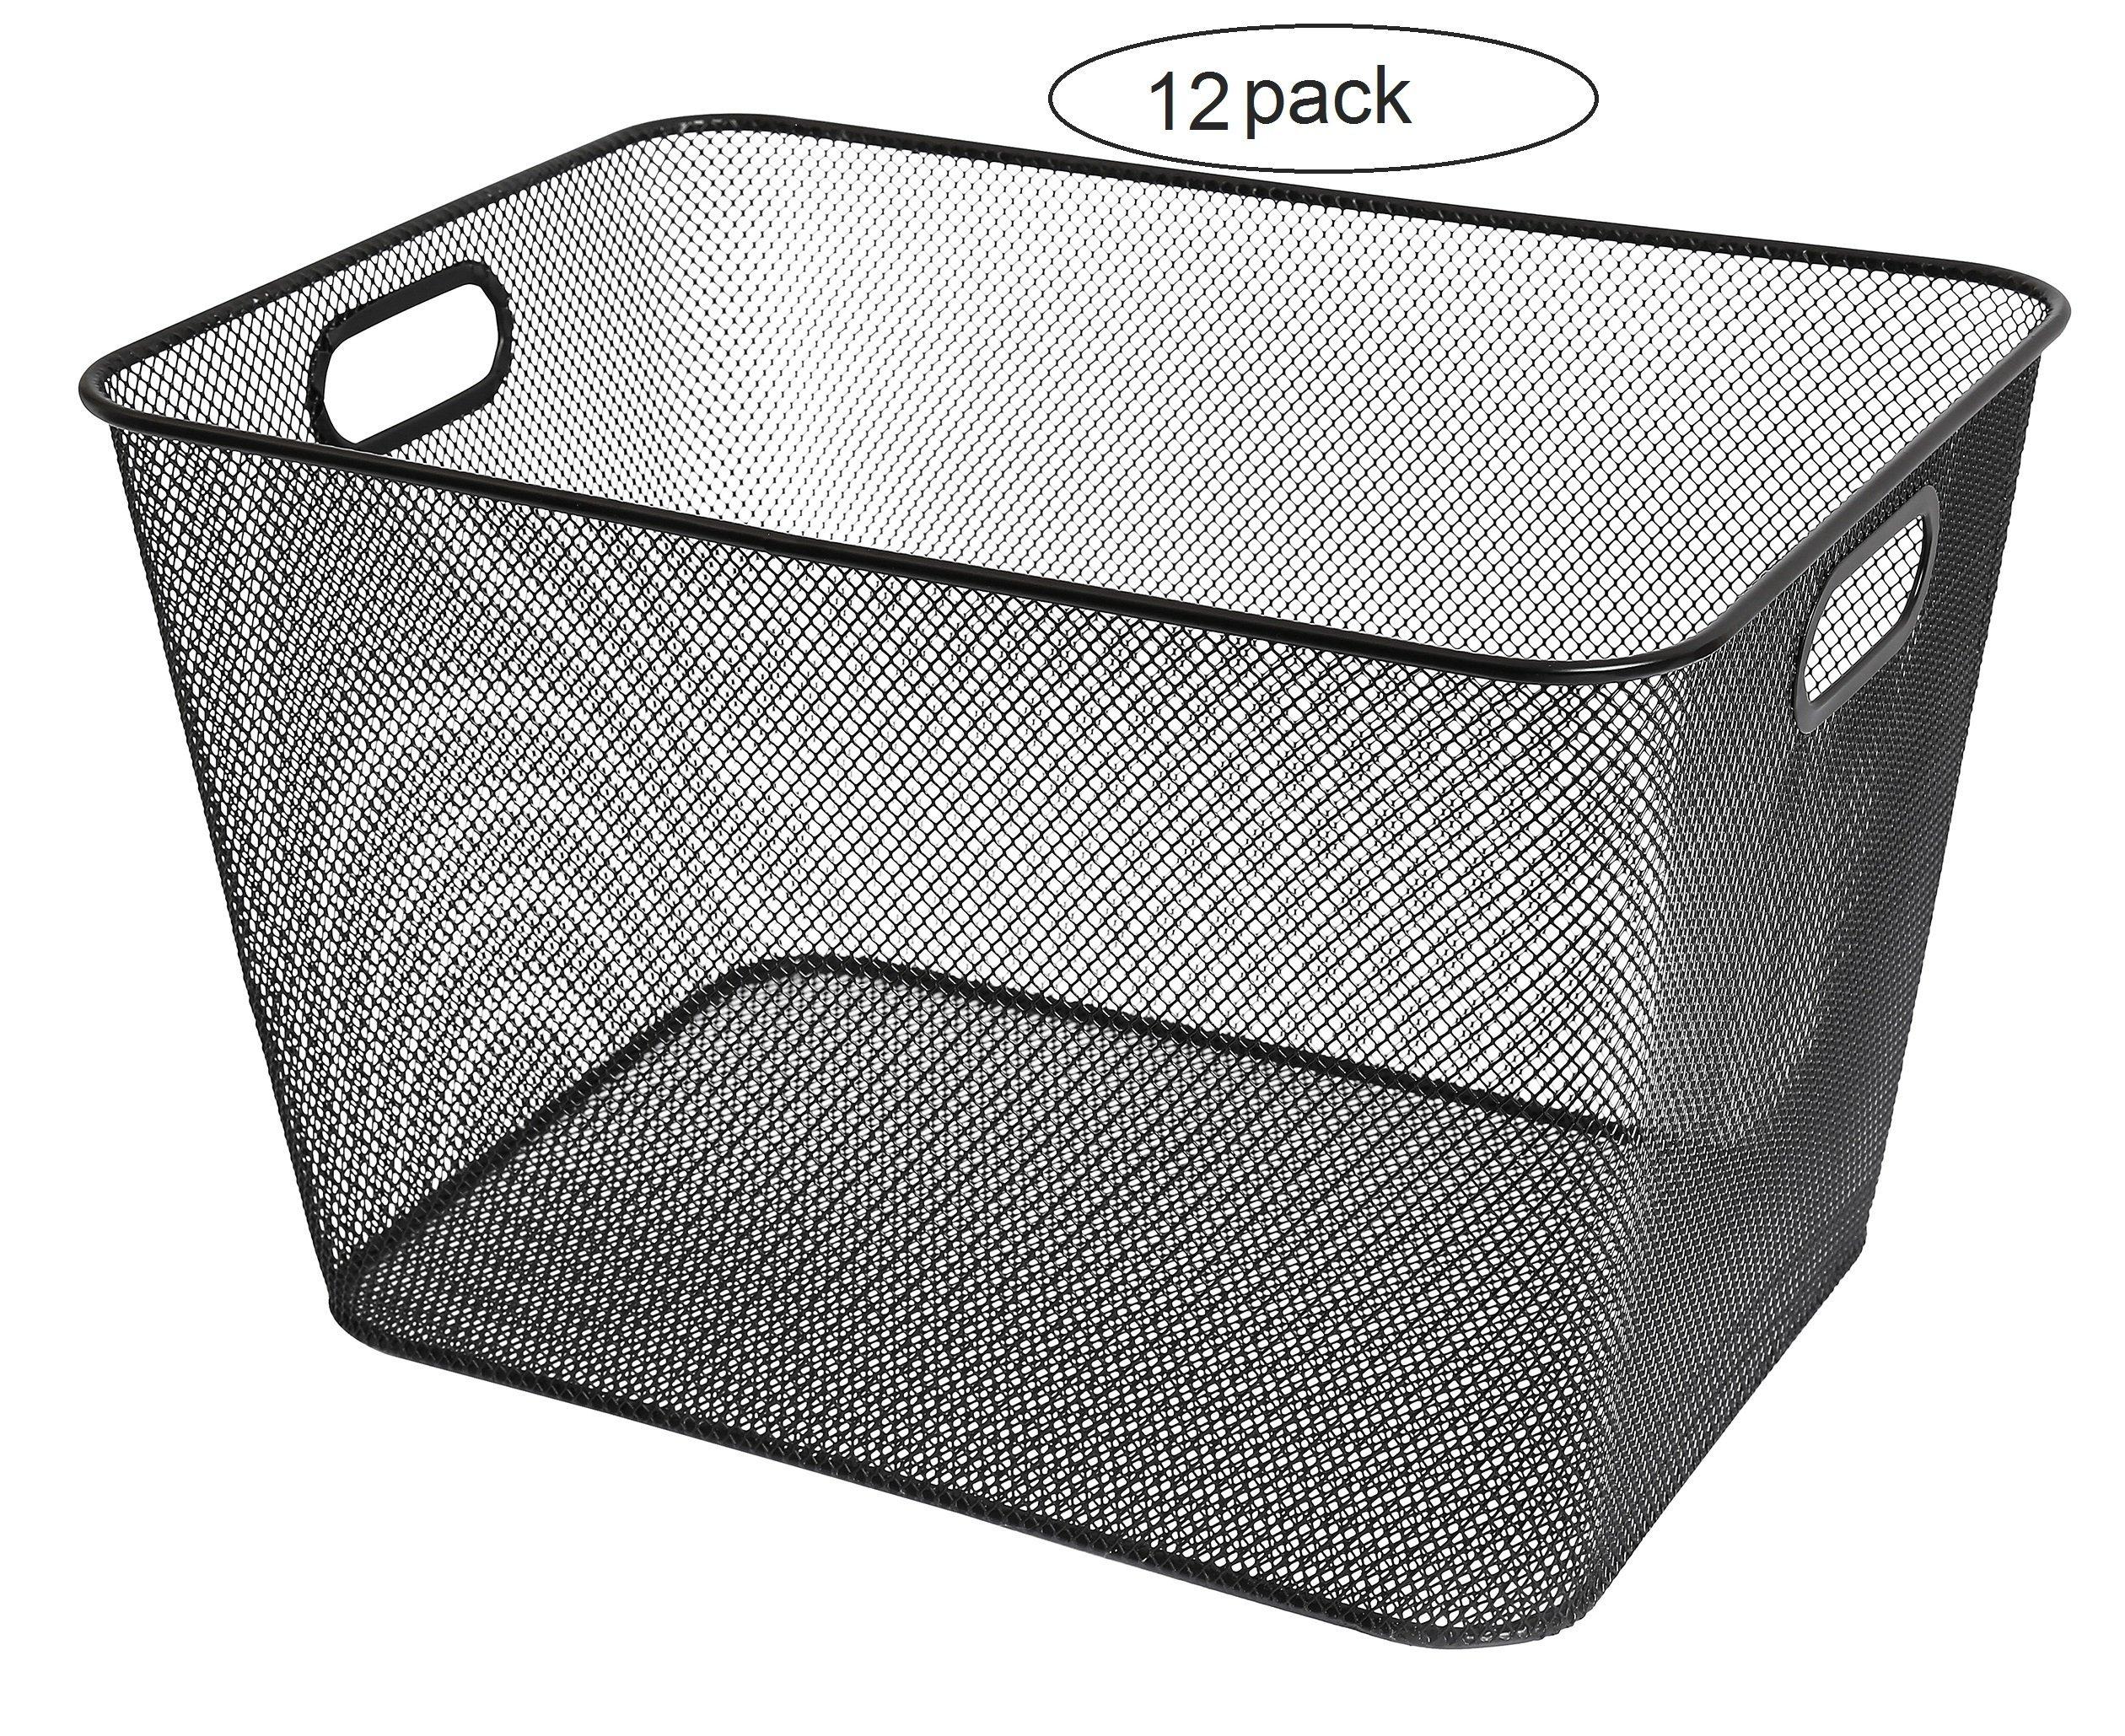 Mesh Open Bin Storage Basket Organizer for Fruits, Vegetables, Pantry Items Toys 2040-12 (12, 14 X 10 X 9)